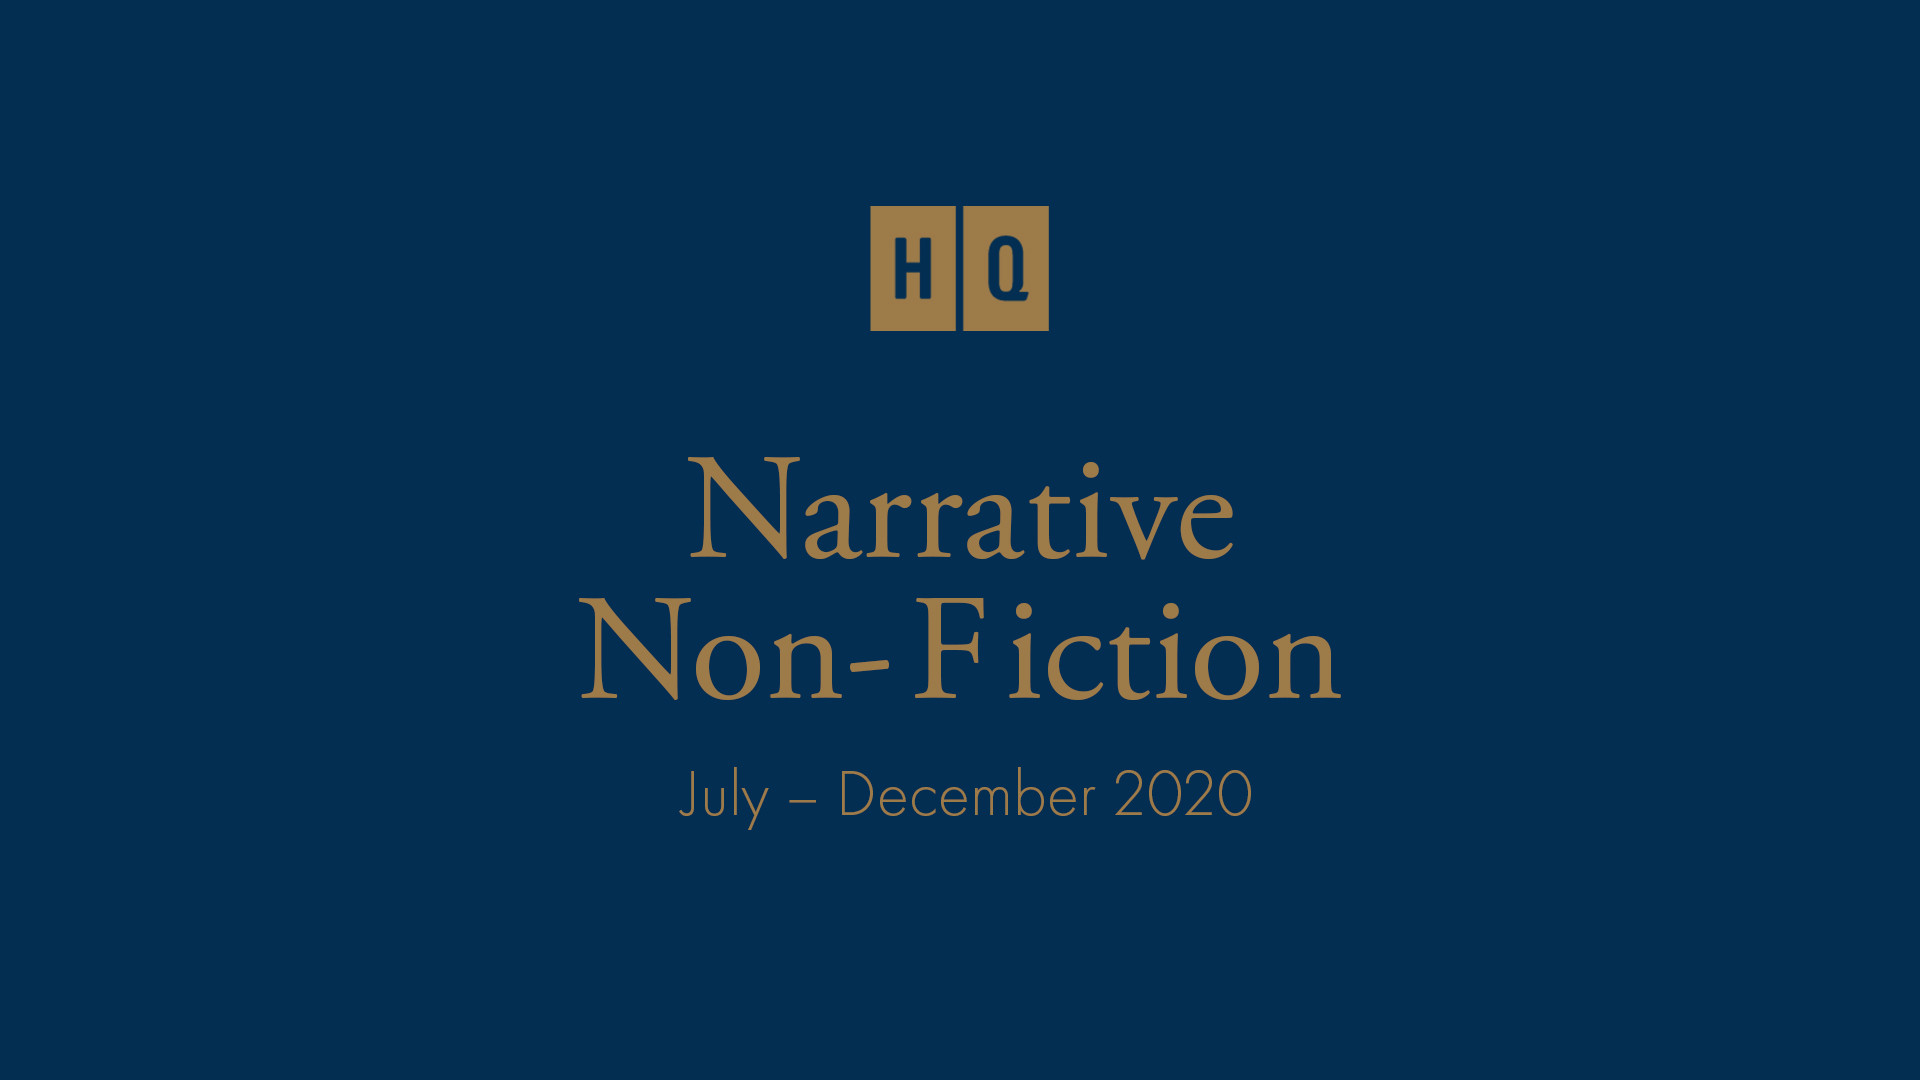 HQ Narrative Non-Fiction